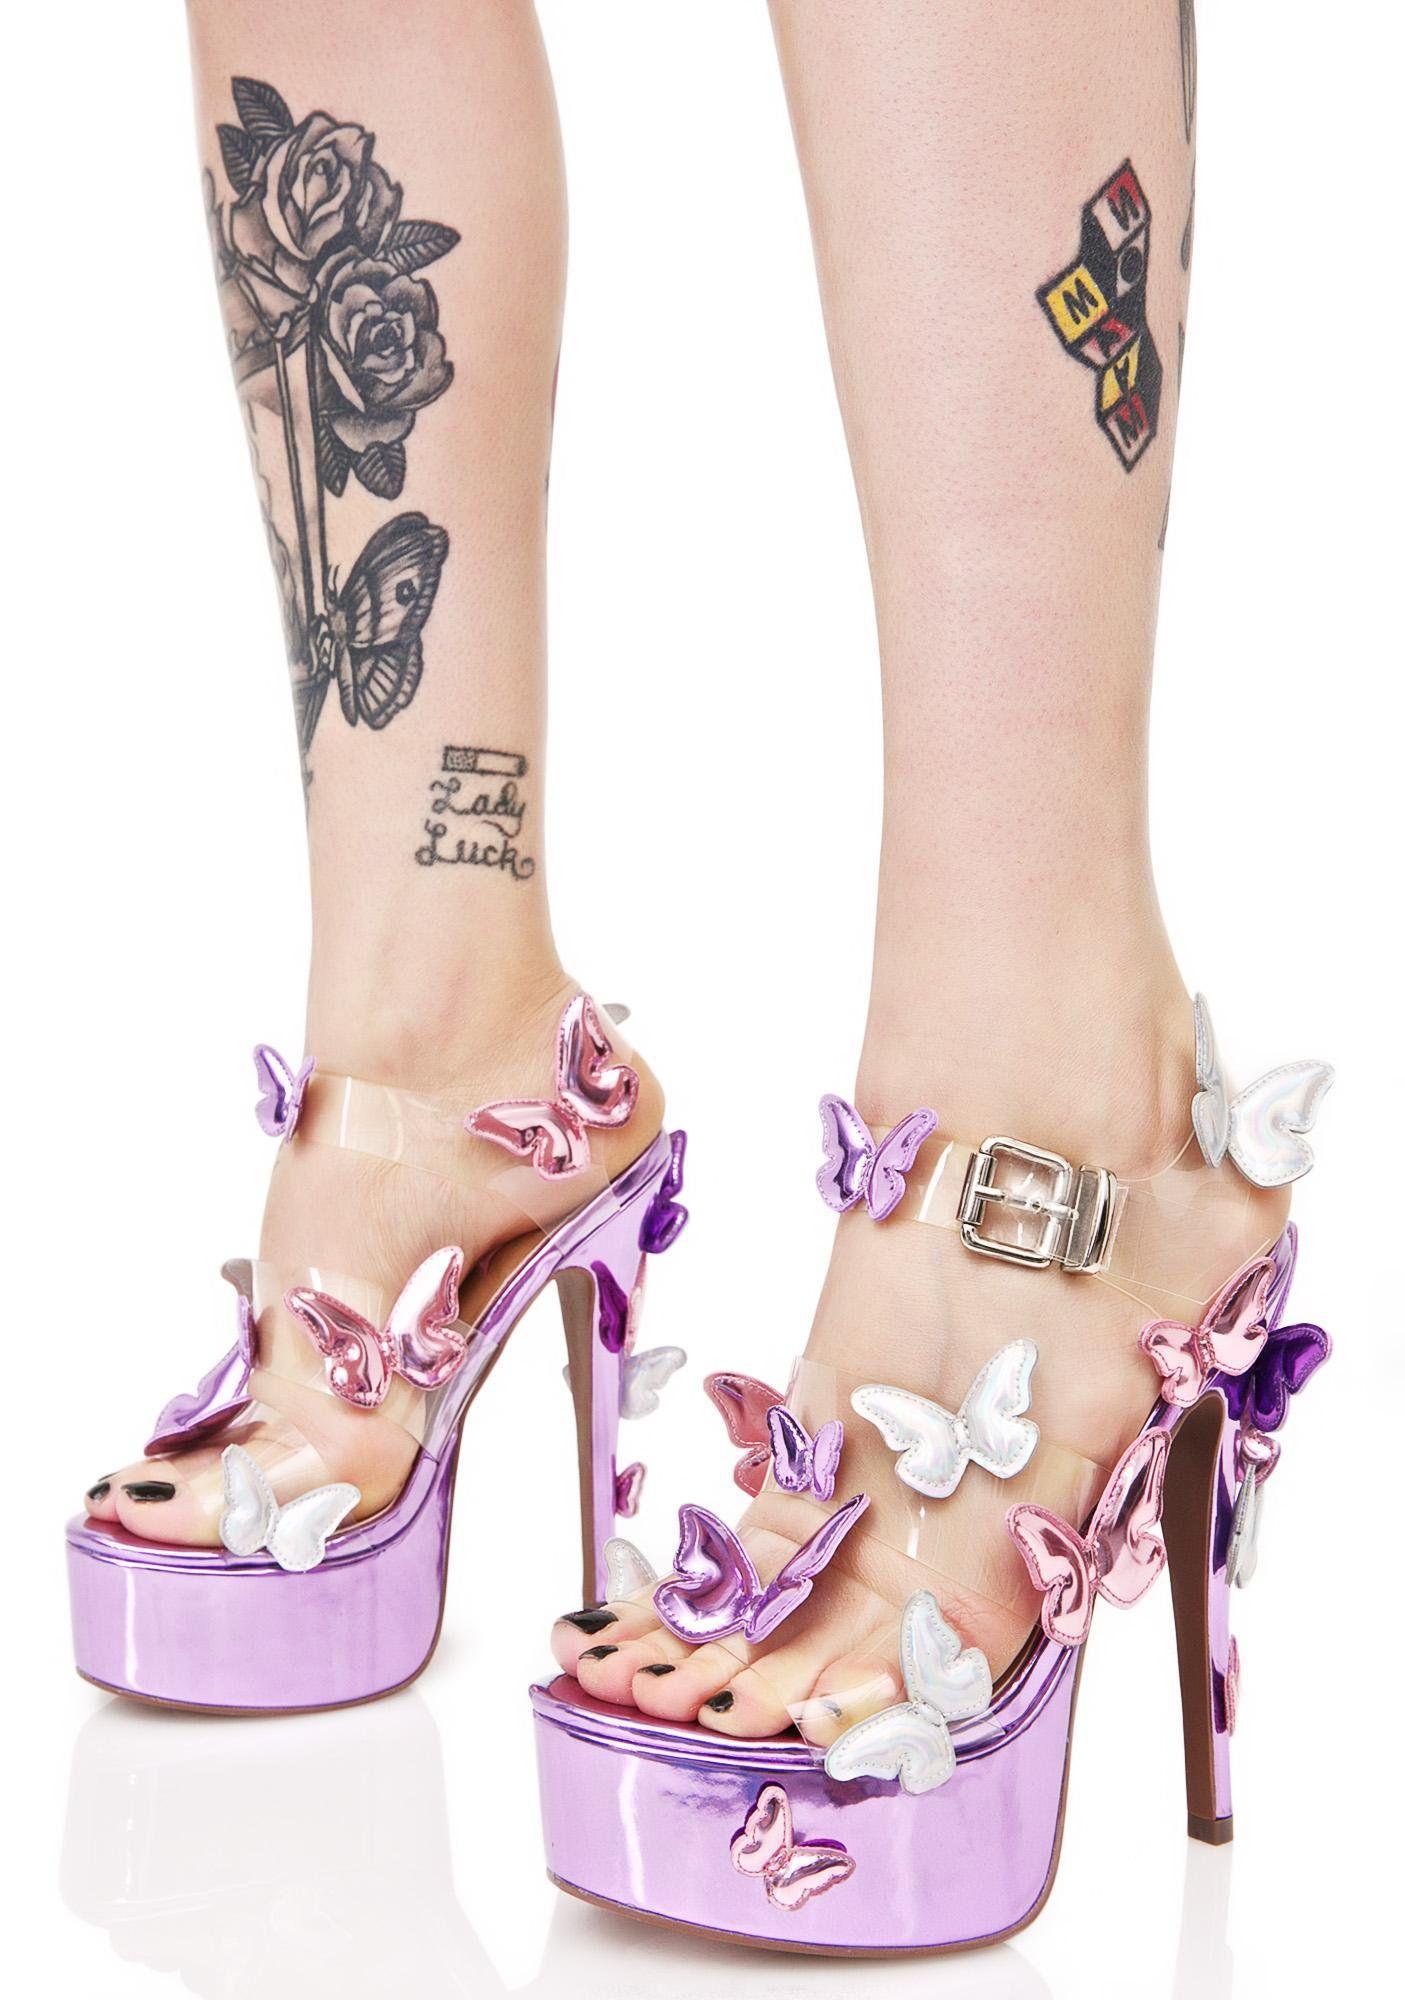 ca2ee9f2a61b Sugar Thrillz Butterfly Baby Platforms yer so gorgeous yew got butterflies  kissin  yer feet